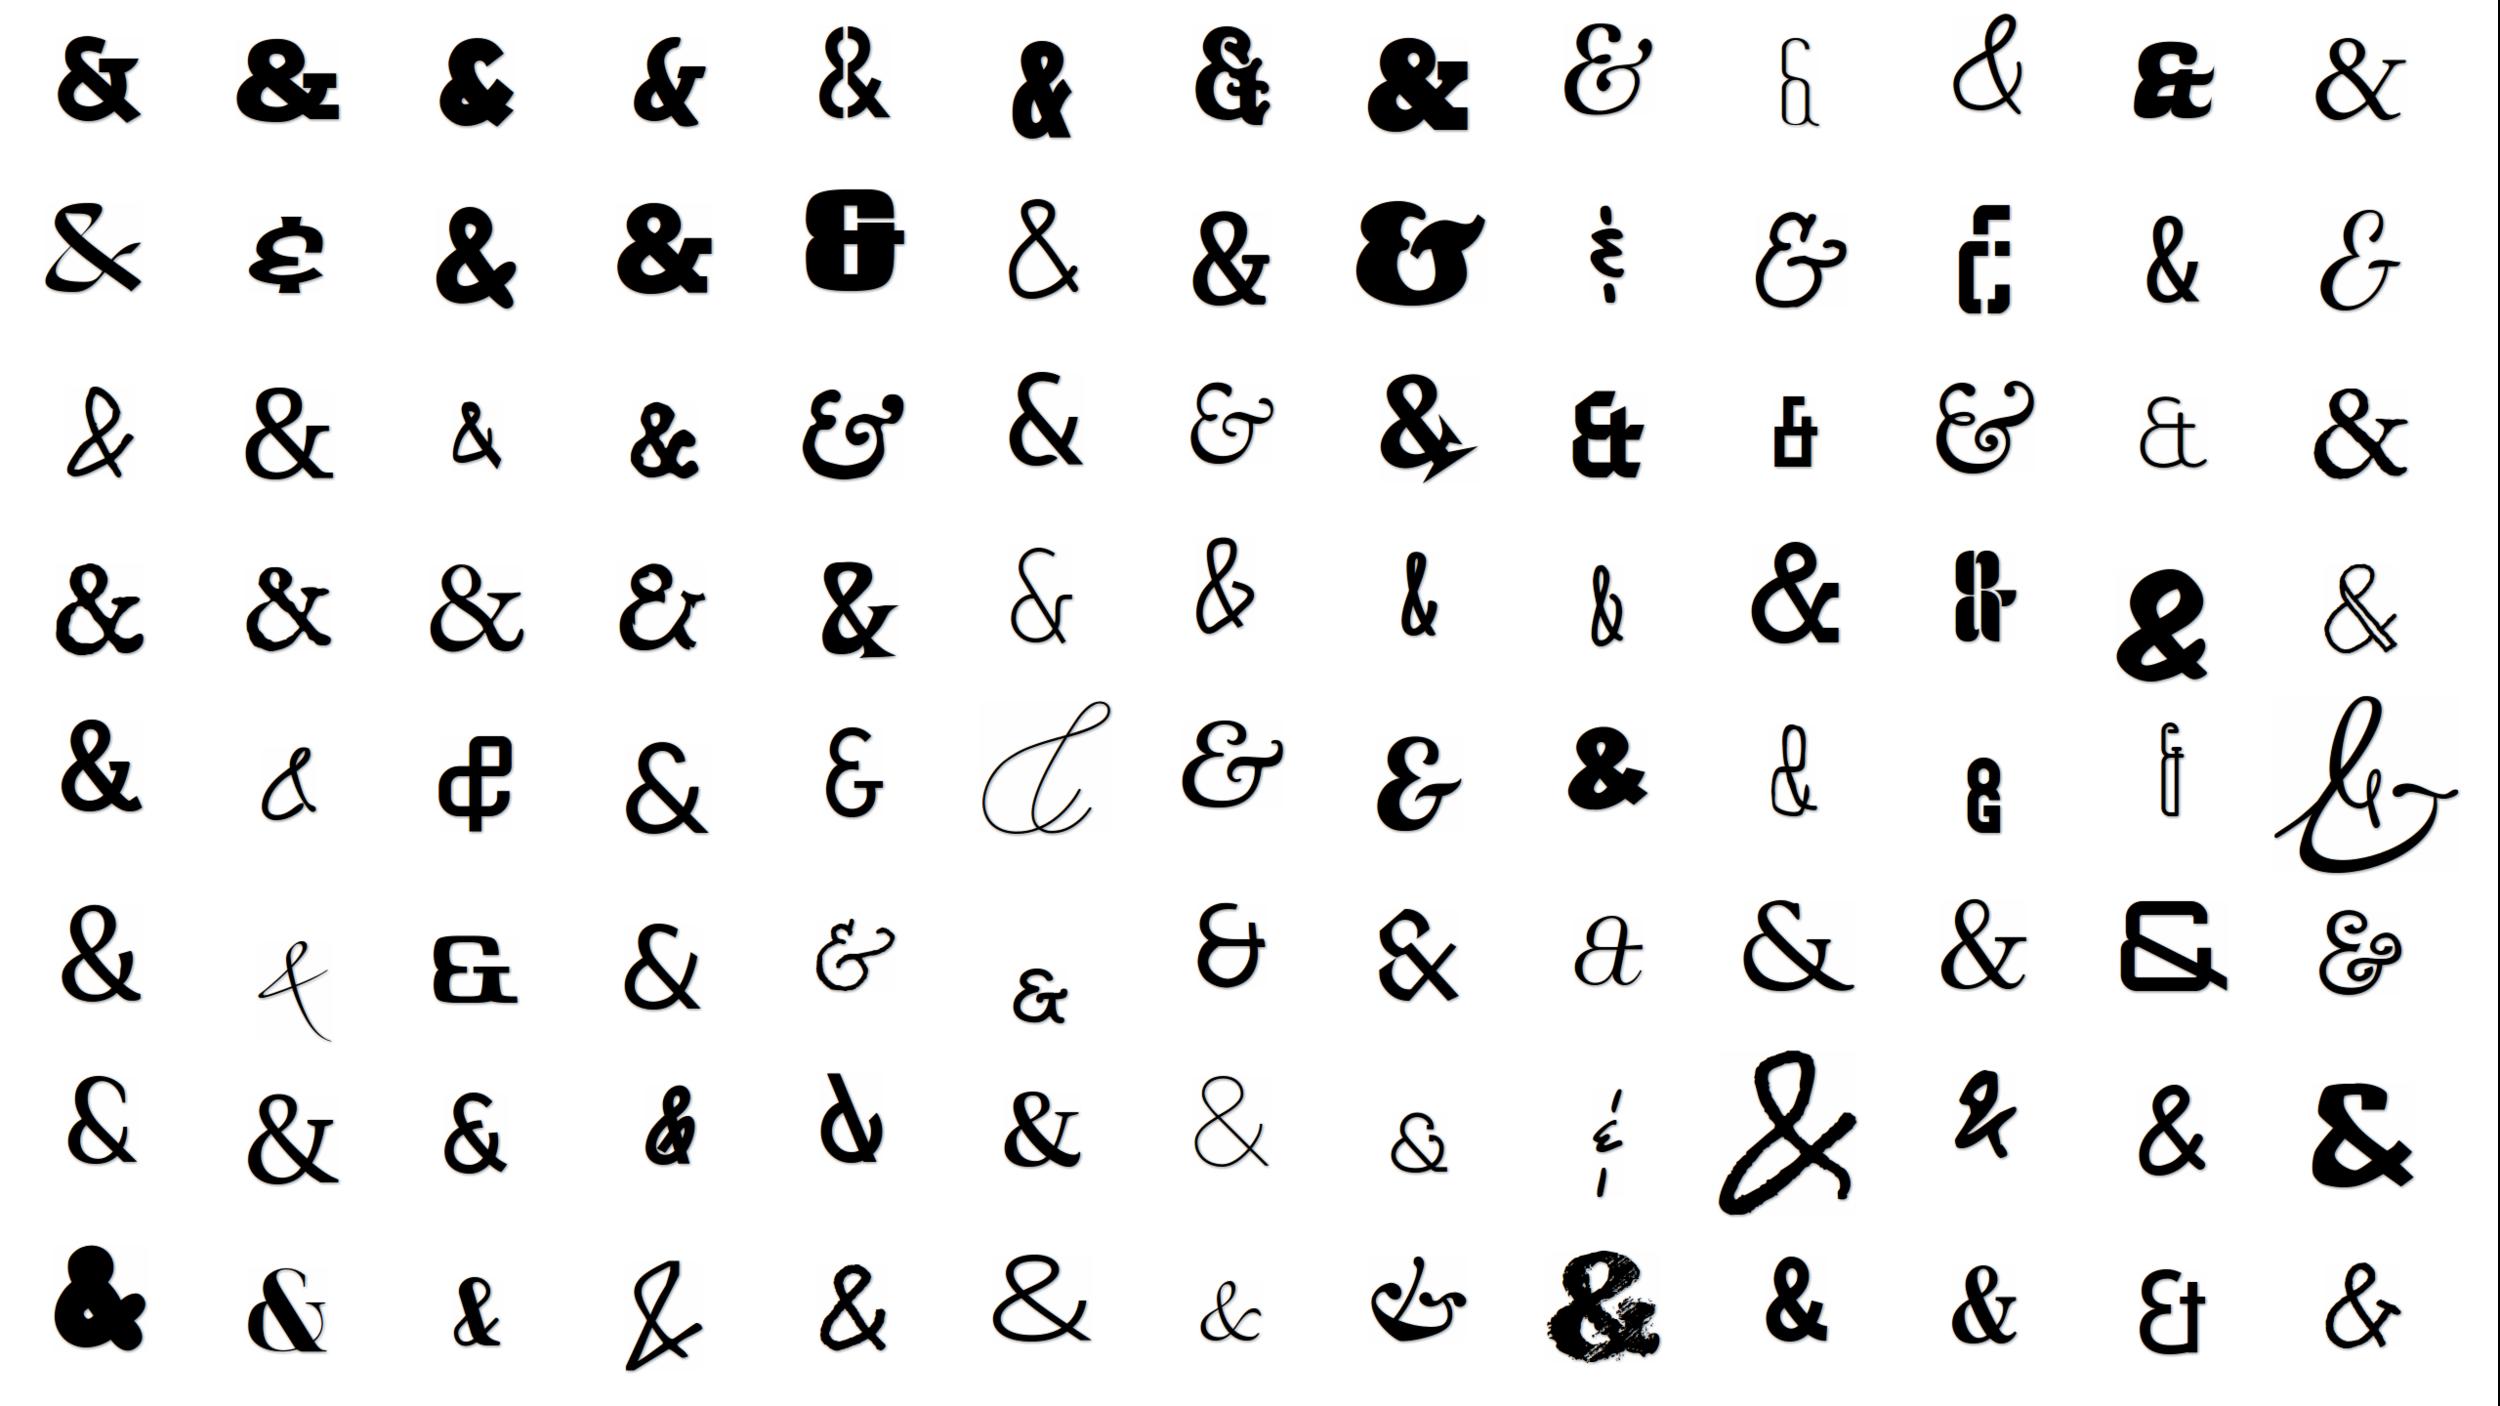 104-open-source-ampersands-2560x1440.png